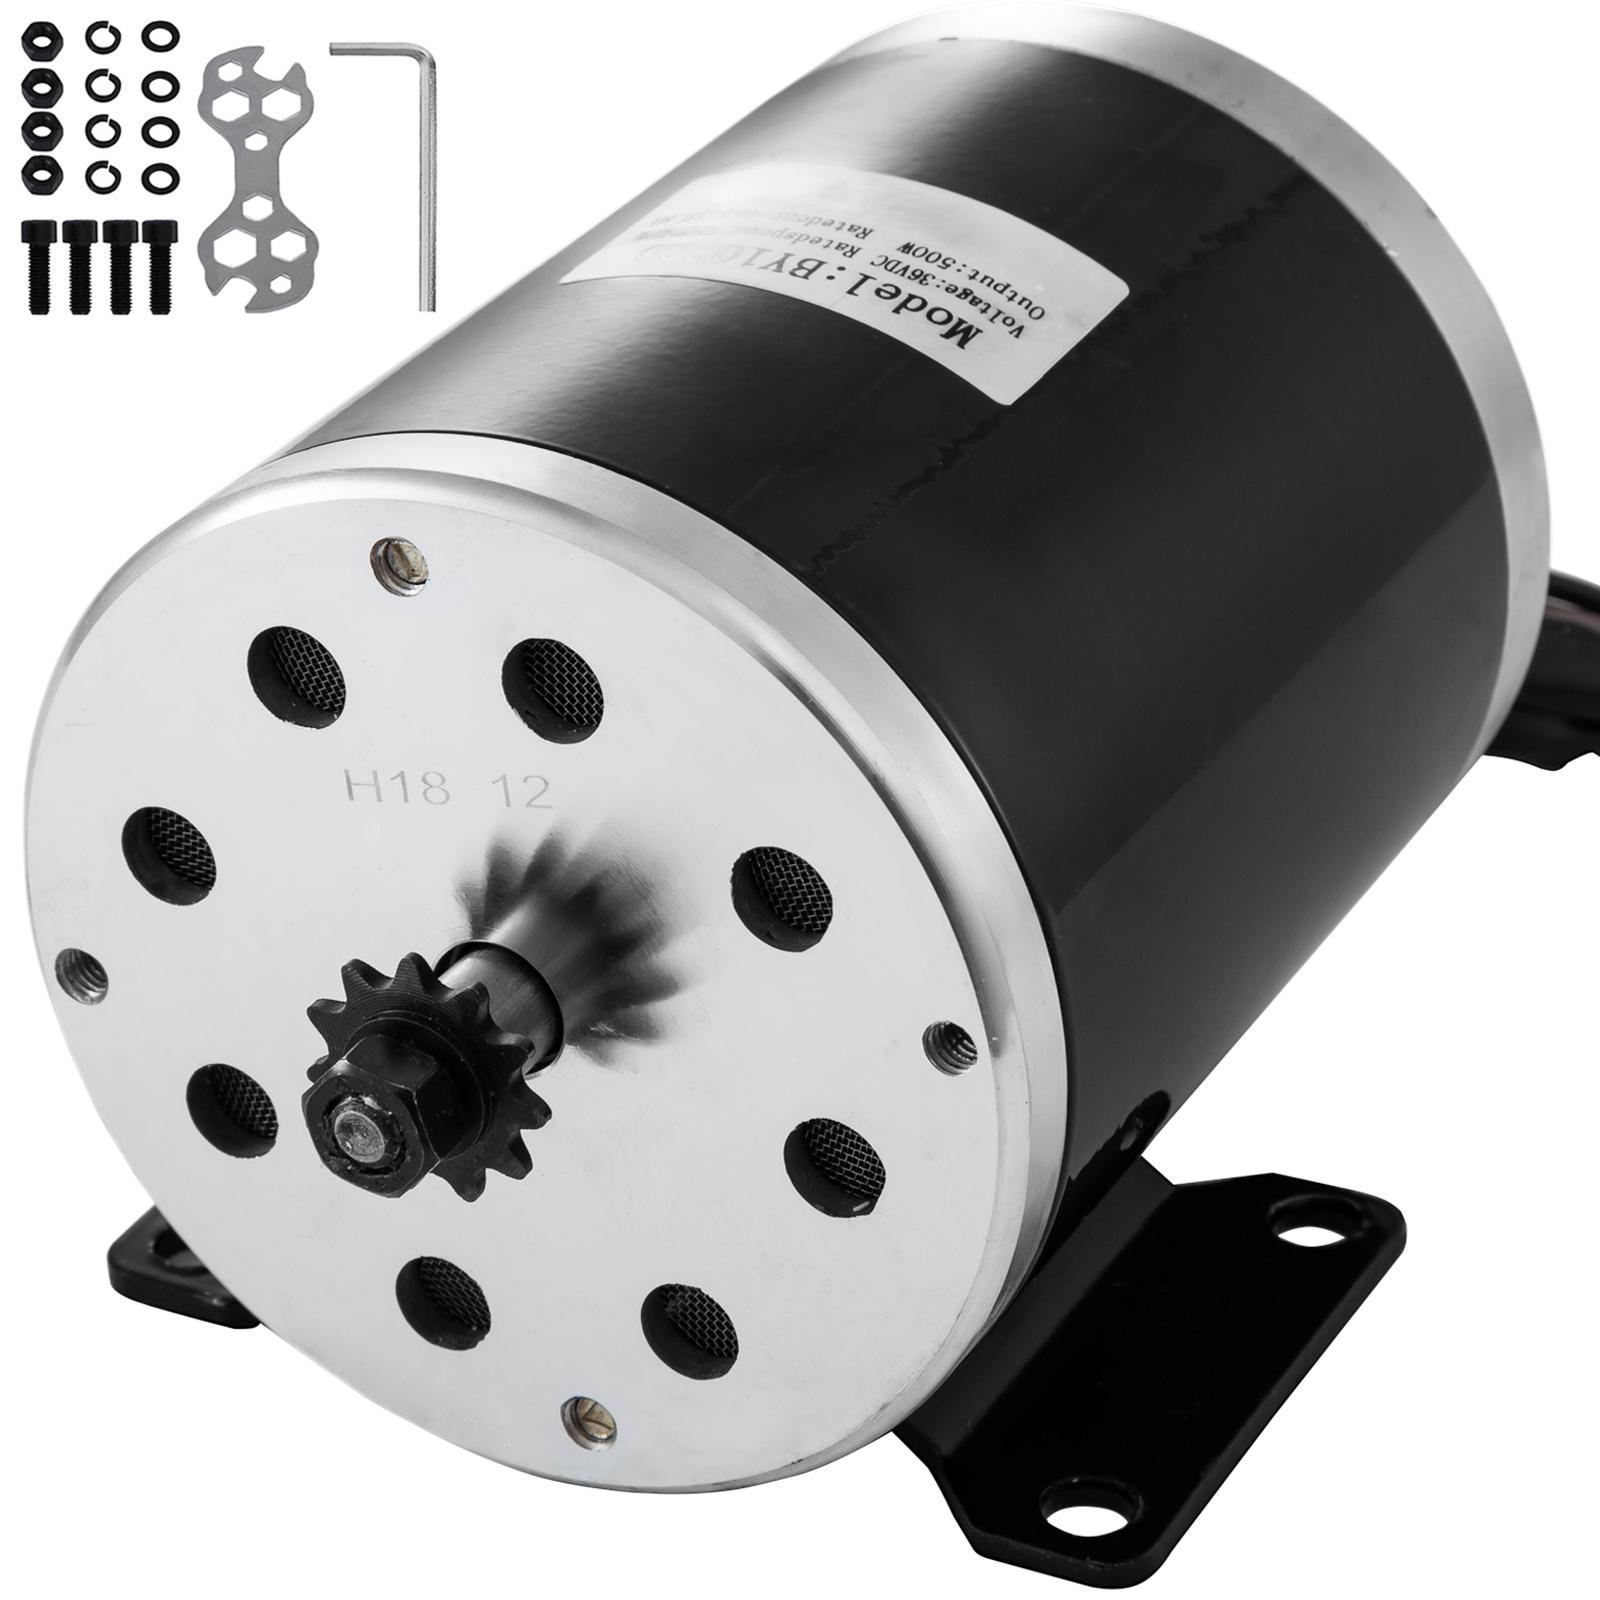 DC-electric-motor-12-60V-150W-2KW-for-scooter-bike-go-kart-minibike-e-ATV thumbnail 85